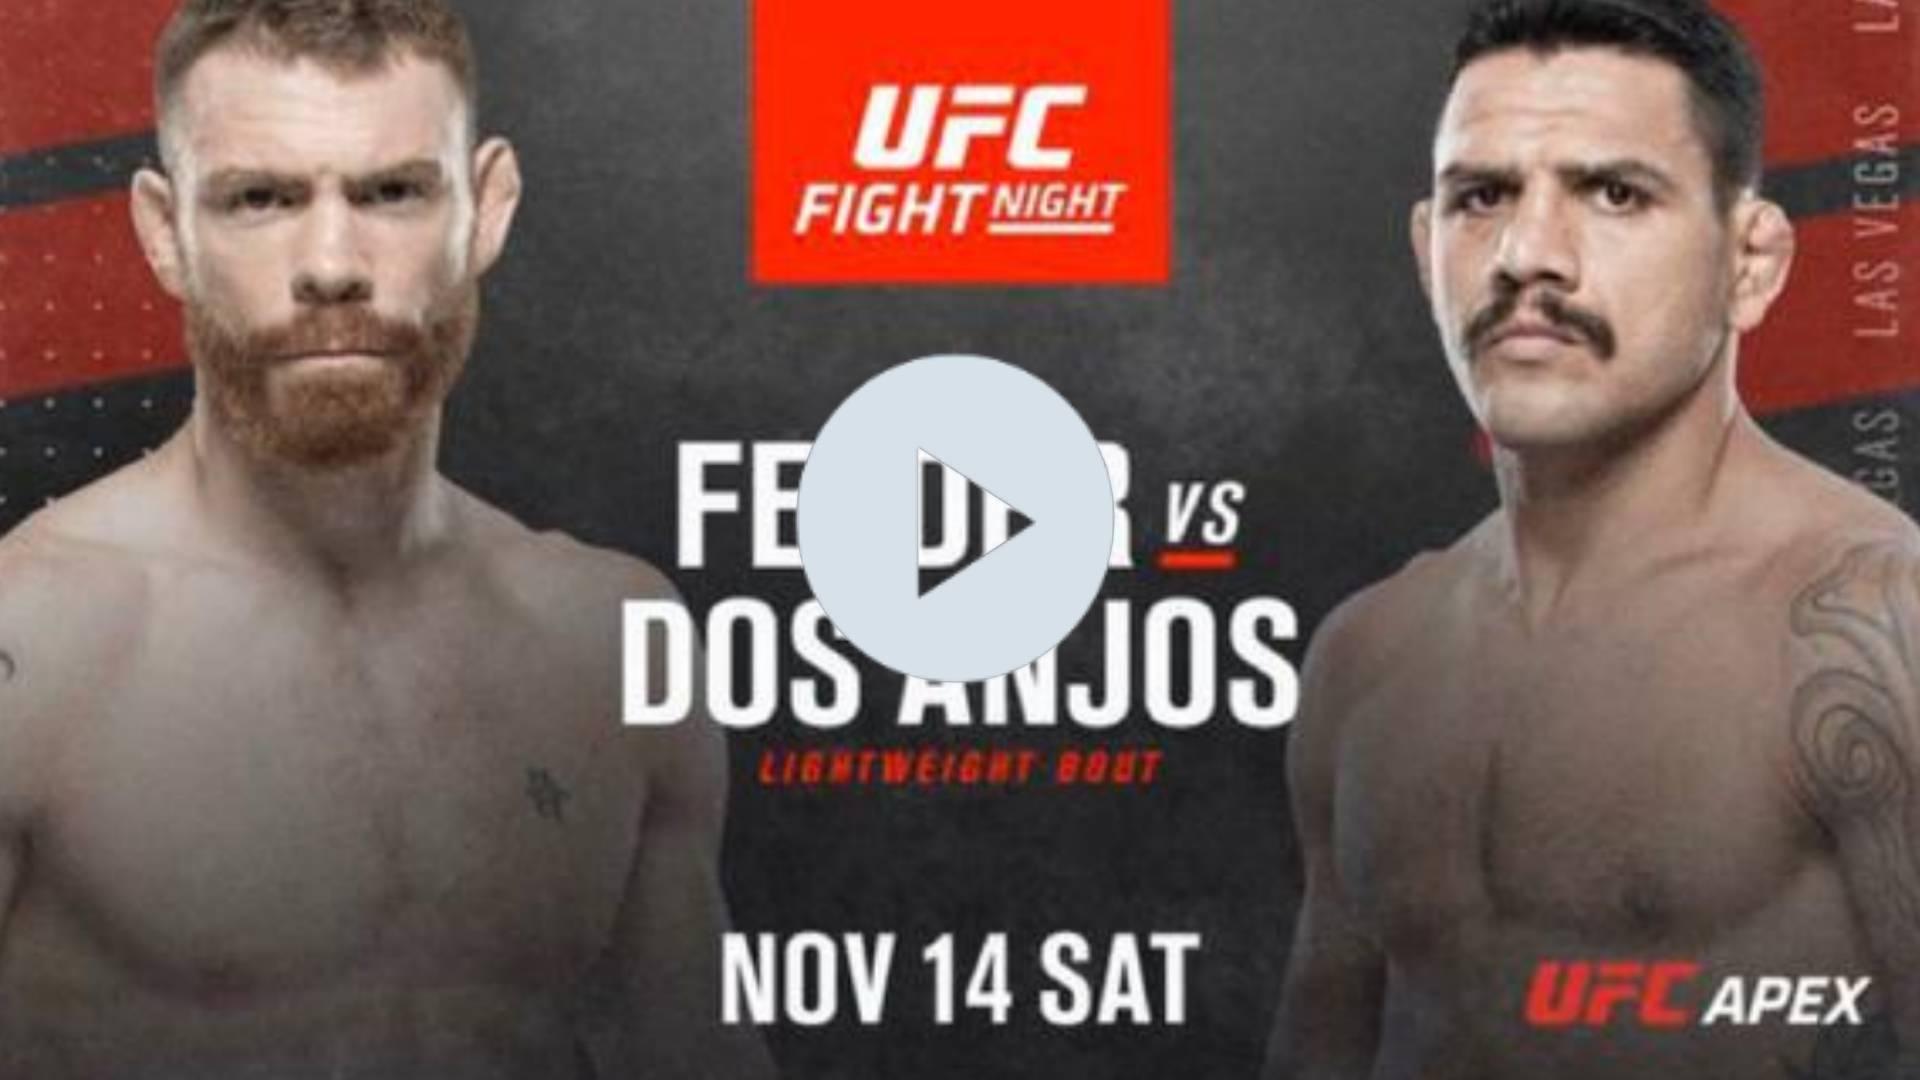 UFC Fight Night EN VIVO: EN VIVO AQUI Felder vs. Dos Anjos